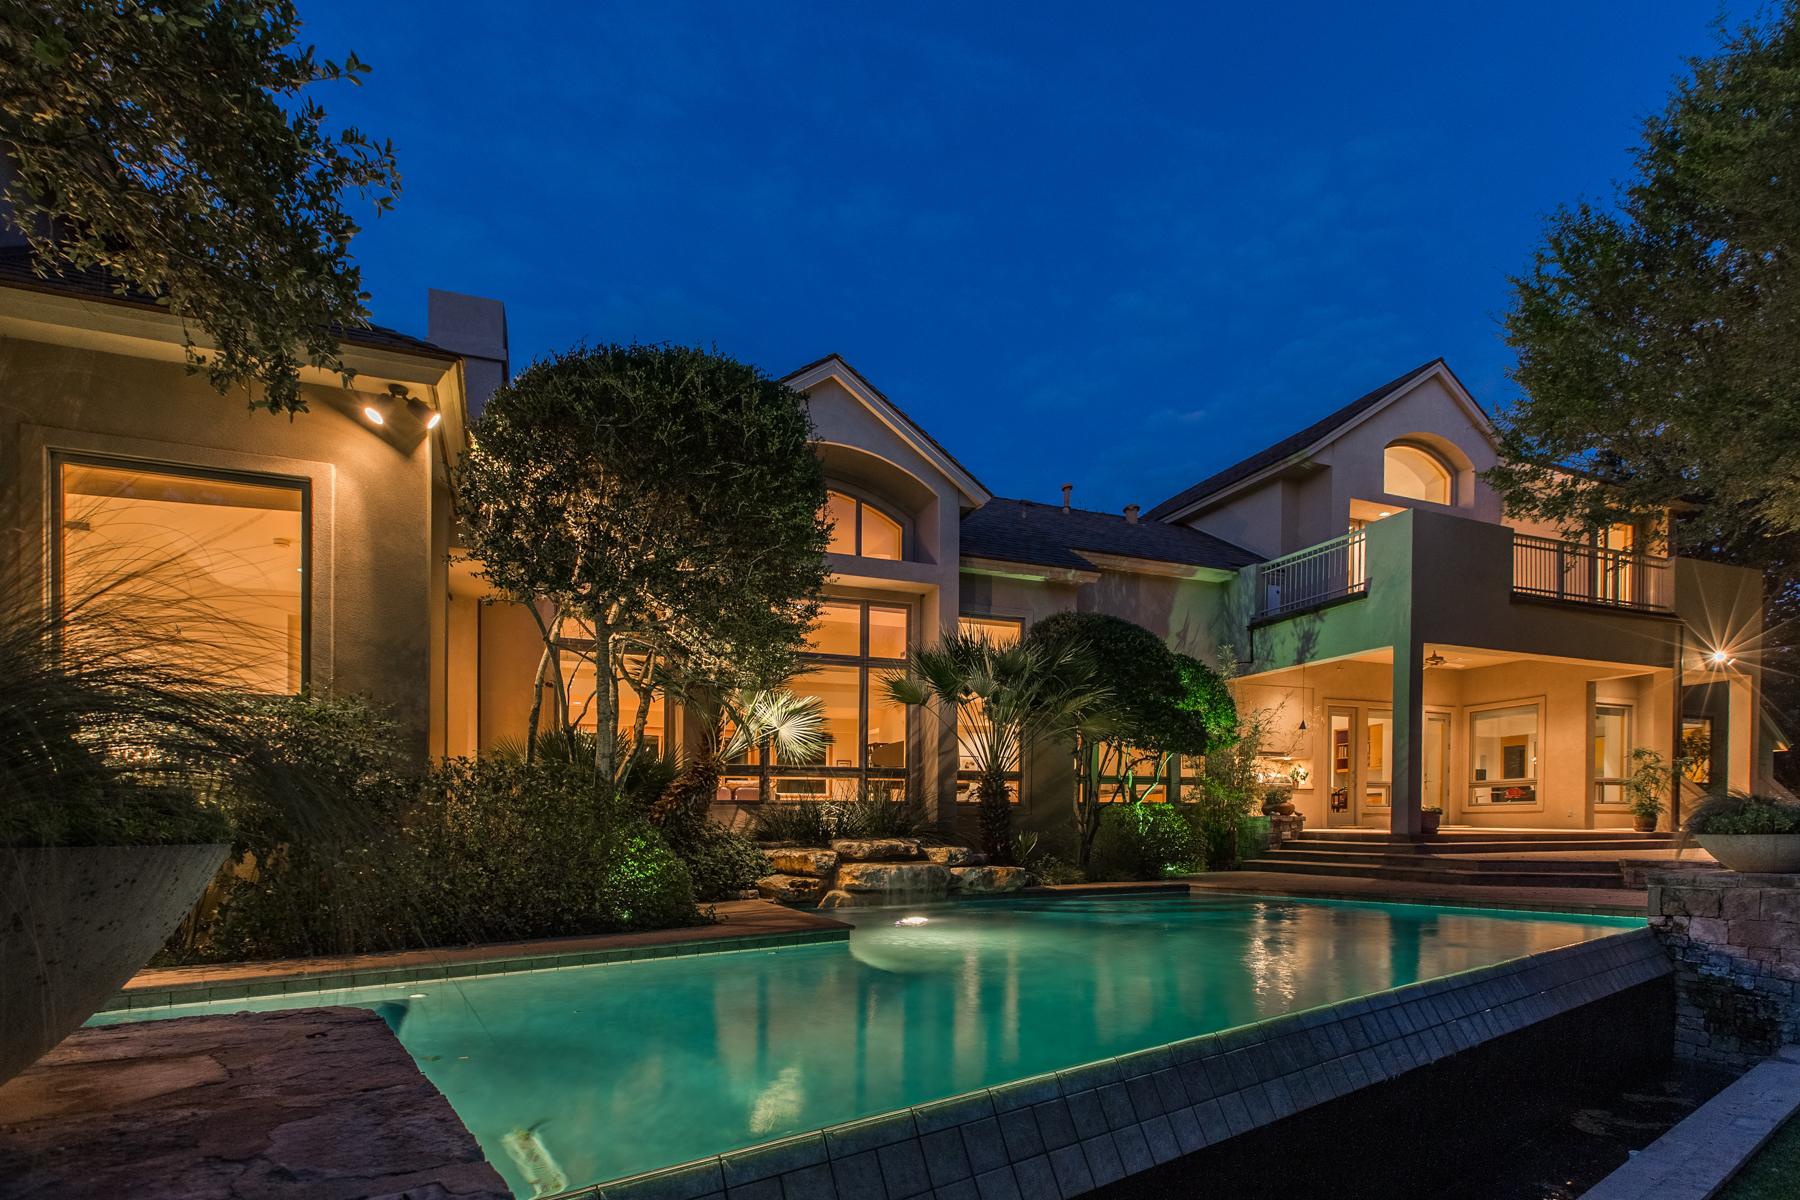 Single Family Home for Rent at Unique and Upscale Dominion Rental 32 Eton Green Cir San Antonio, Texas 78257 United States